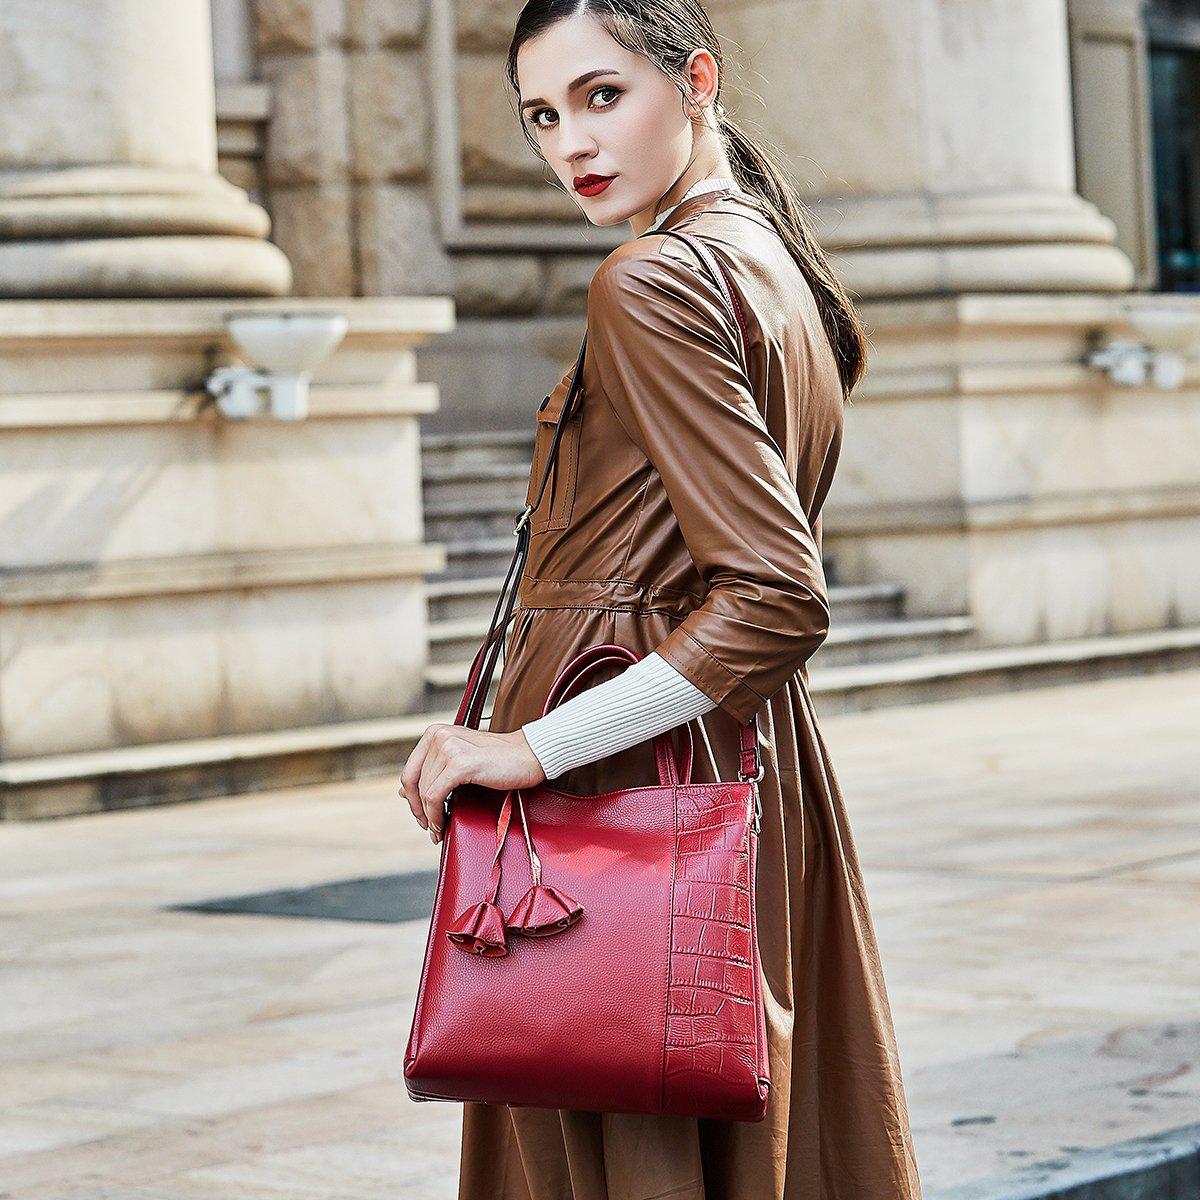 634198732269 70% discount on ZOOLER GLOBAL Womens Leather Cowhide Handbag Top ...